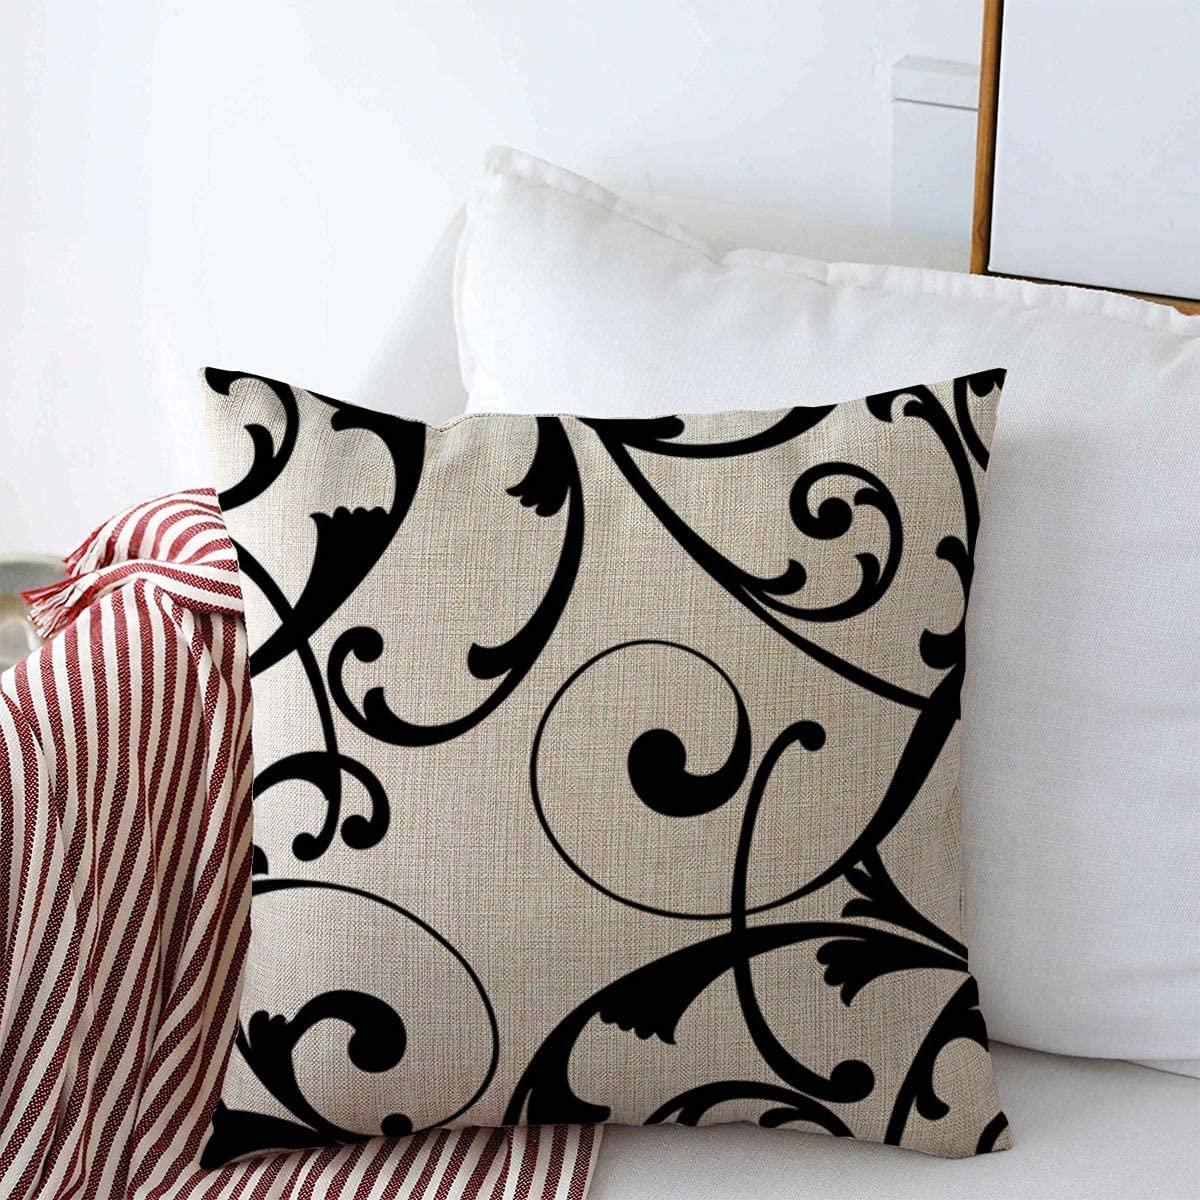 Starofeb Throw Pillow Case Curve Vine Vintage Baroque Scroll Pattern Graphic Line Border Swirl Damask Black Design Modern Farmhouse Decorative Cushion Pillows Pillowcase 18x18 for Home Decor